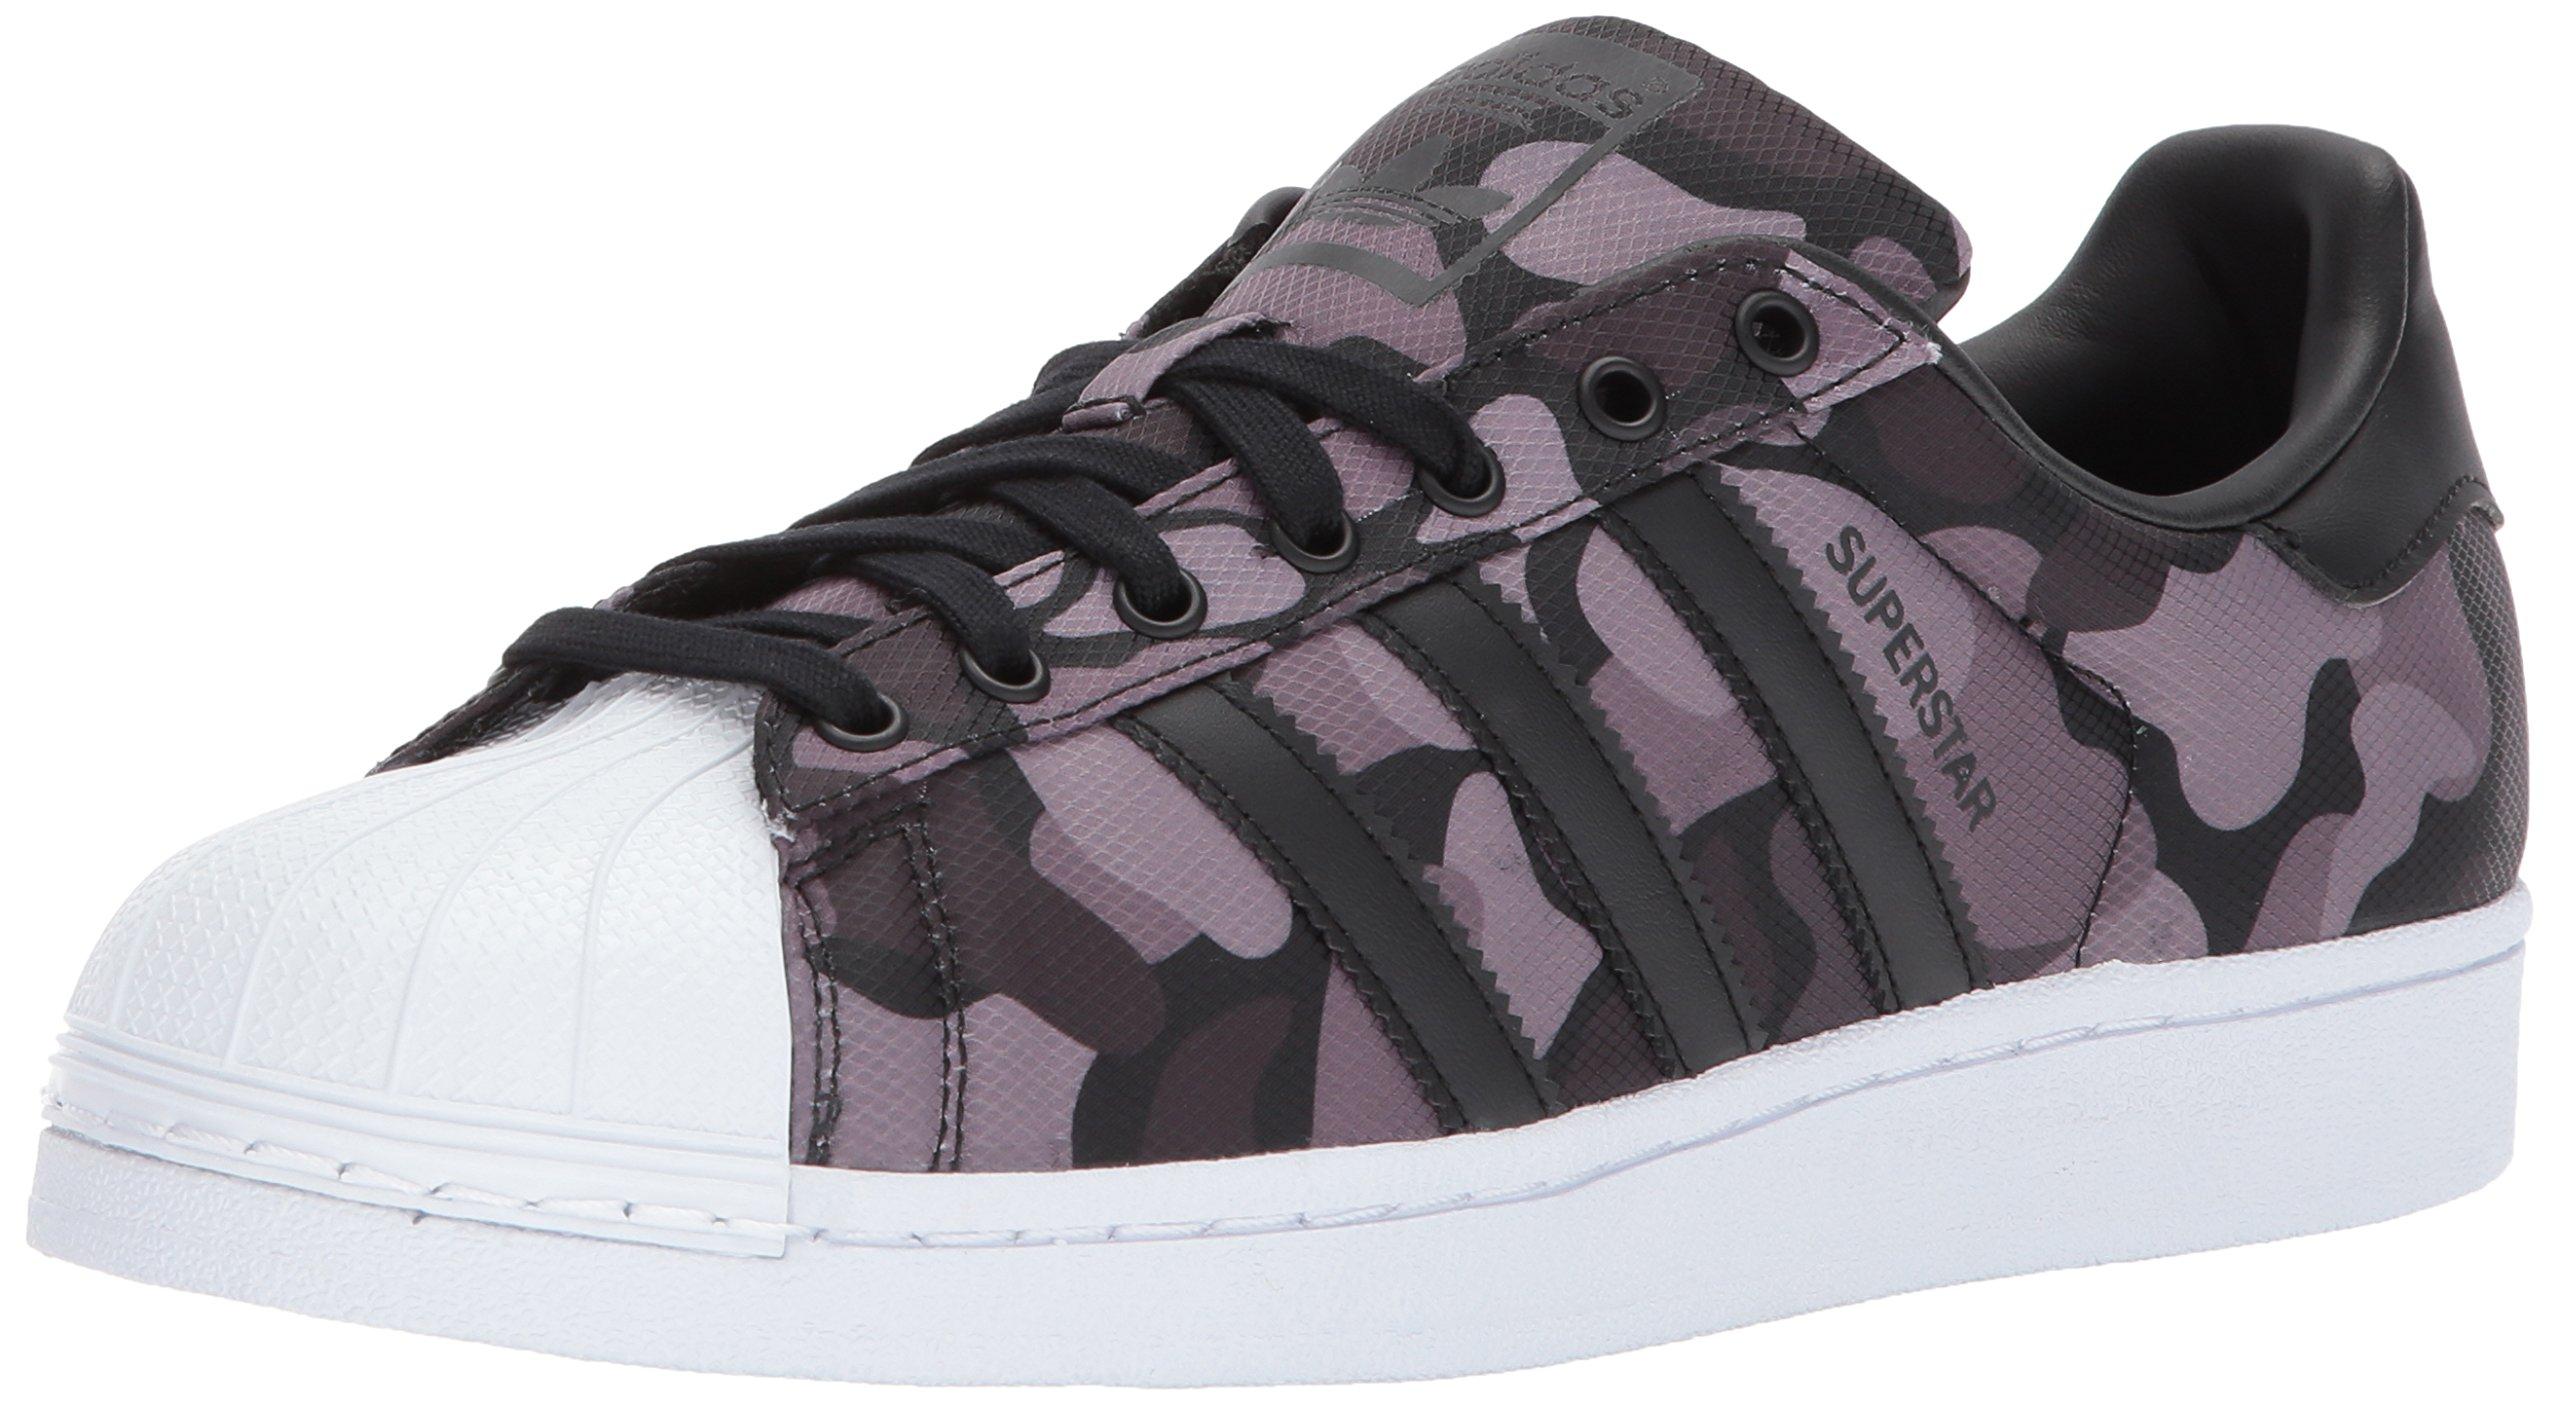 adidas Originals Men's Superstar Foundation Casual Sneaker, Black/Black/Black Snake, 5 D(M) US